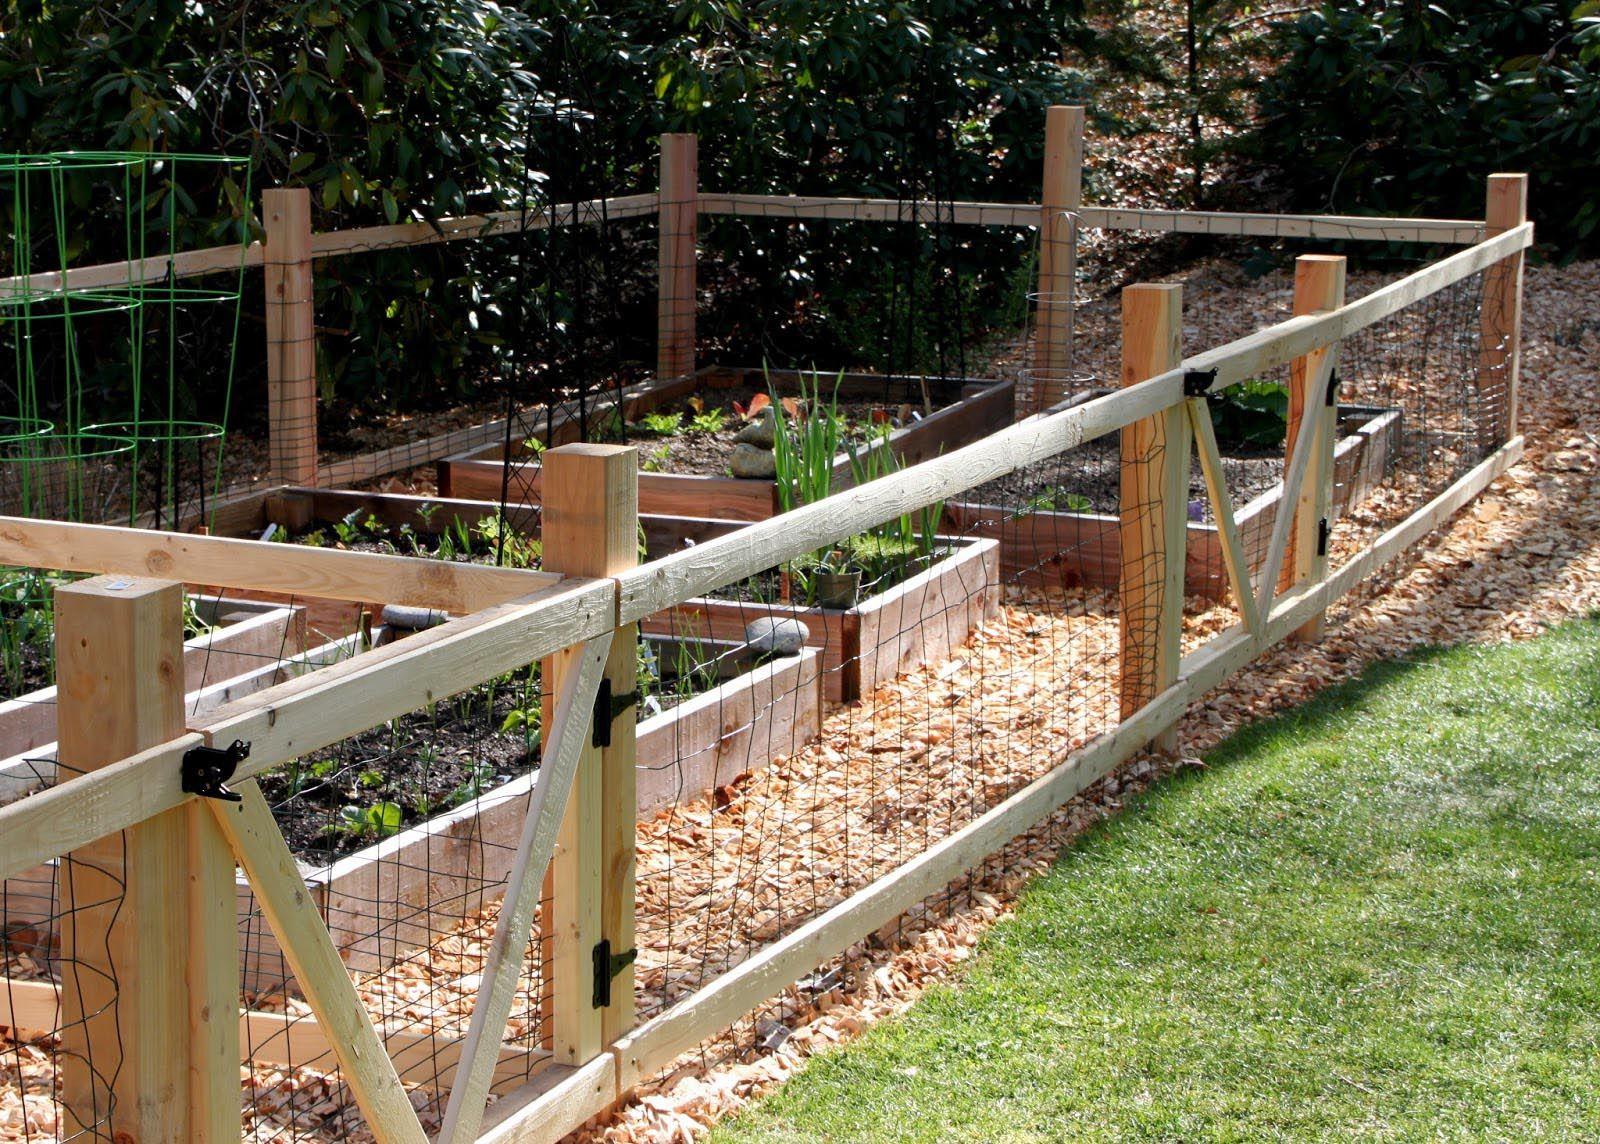 Building Fence Around Vegetable Garden Small Garden Fence Diy